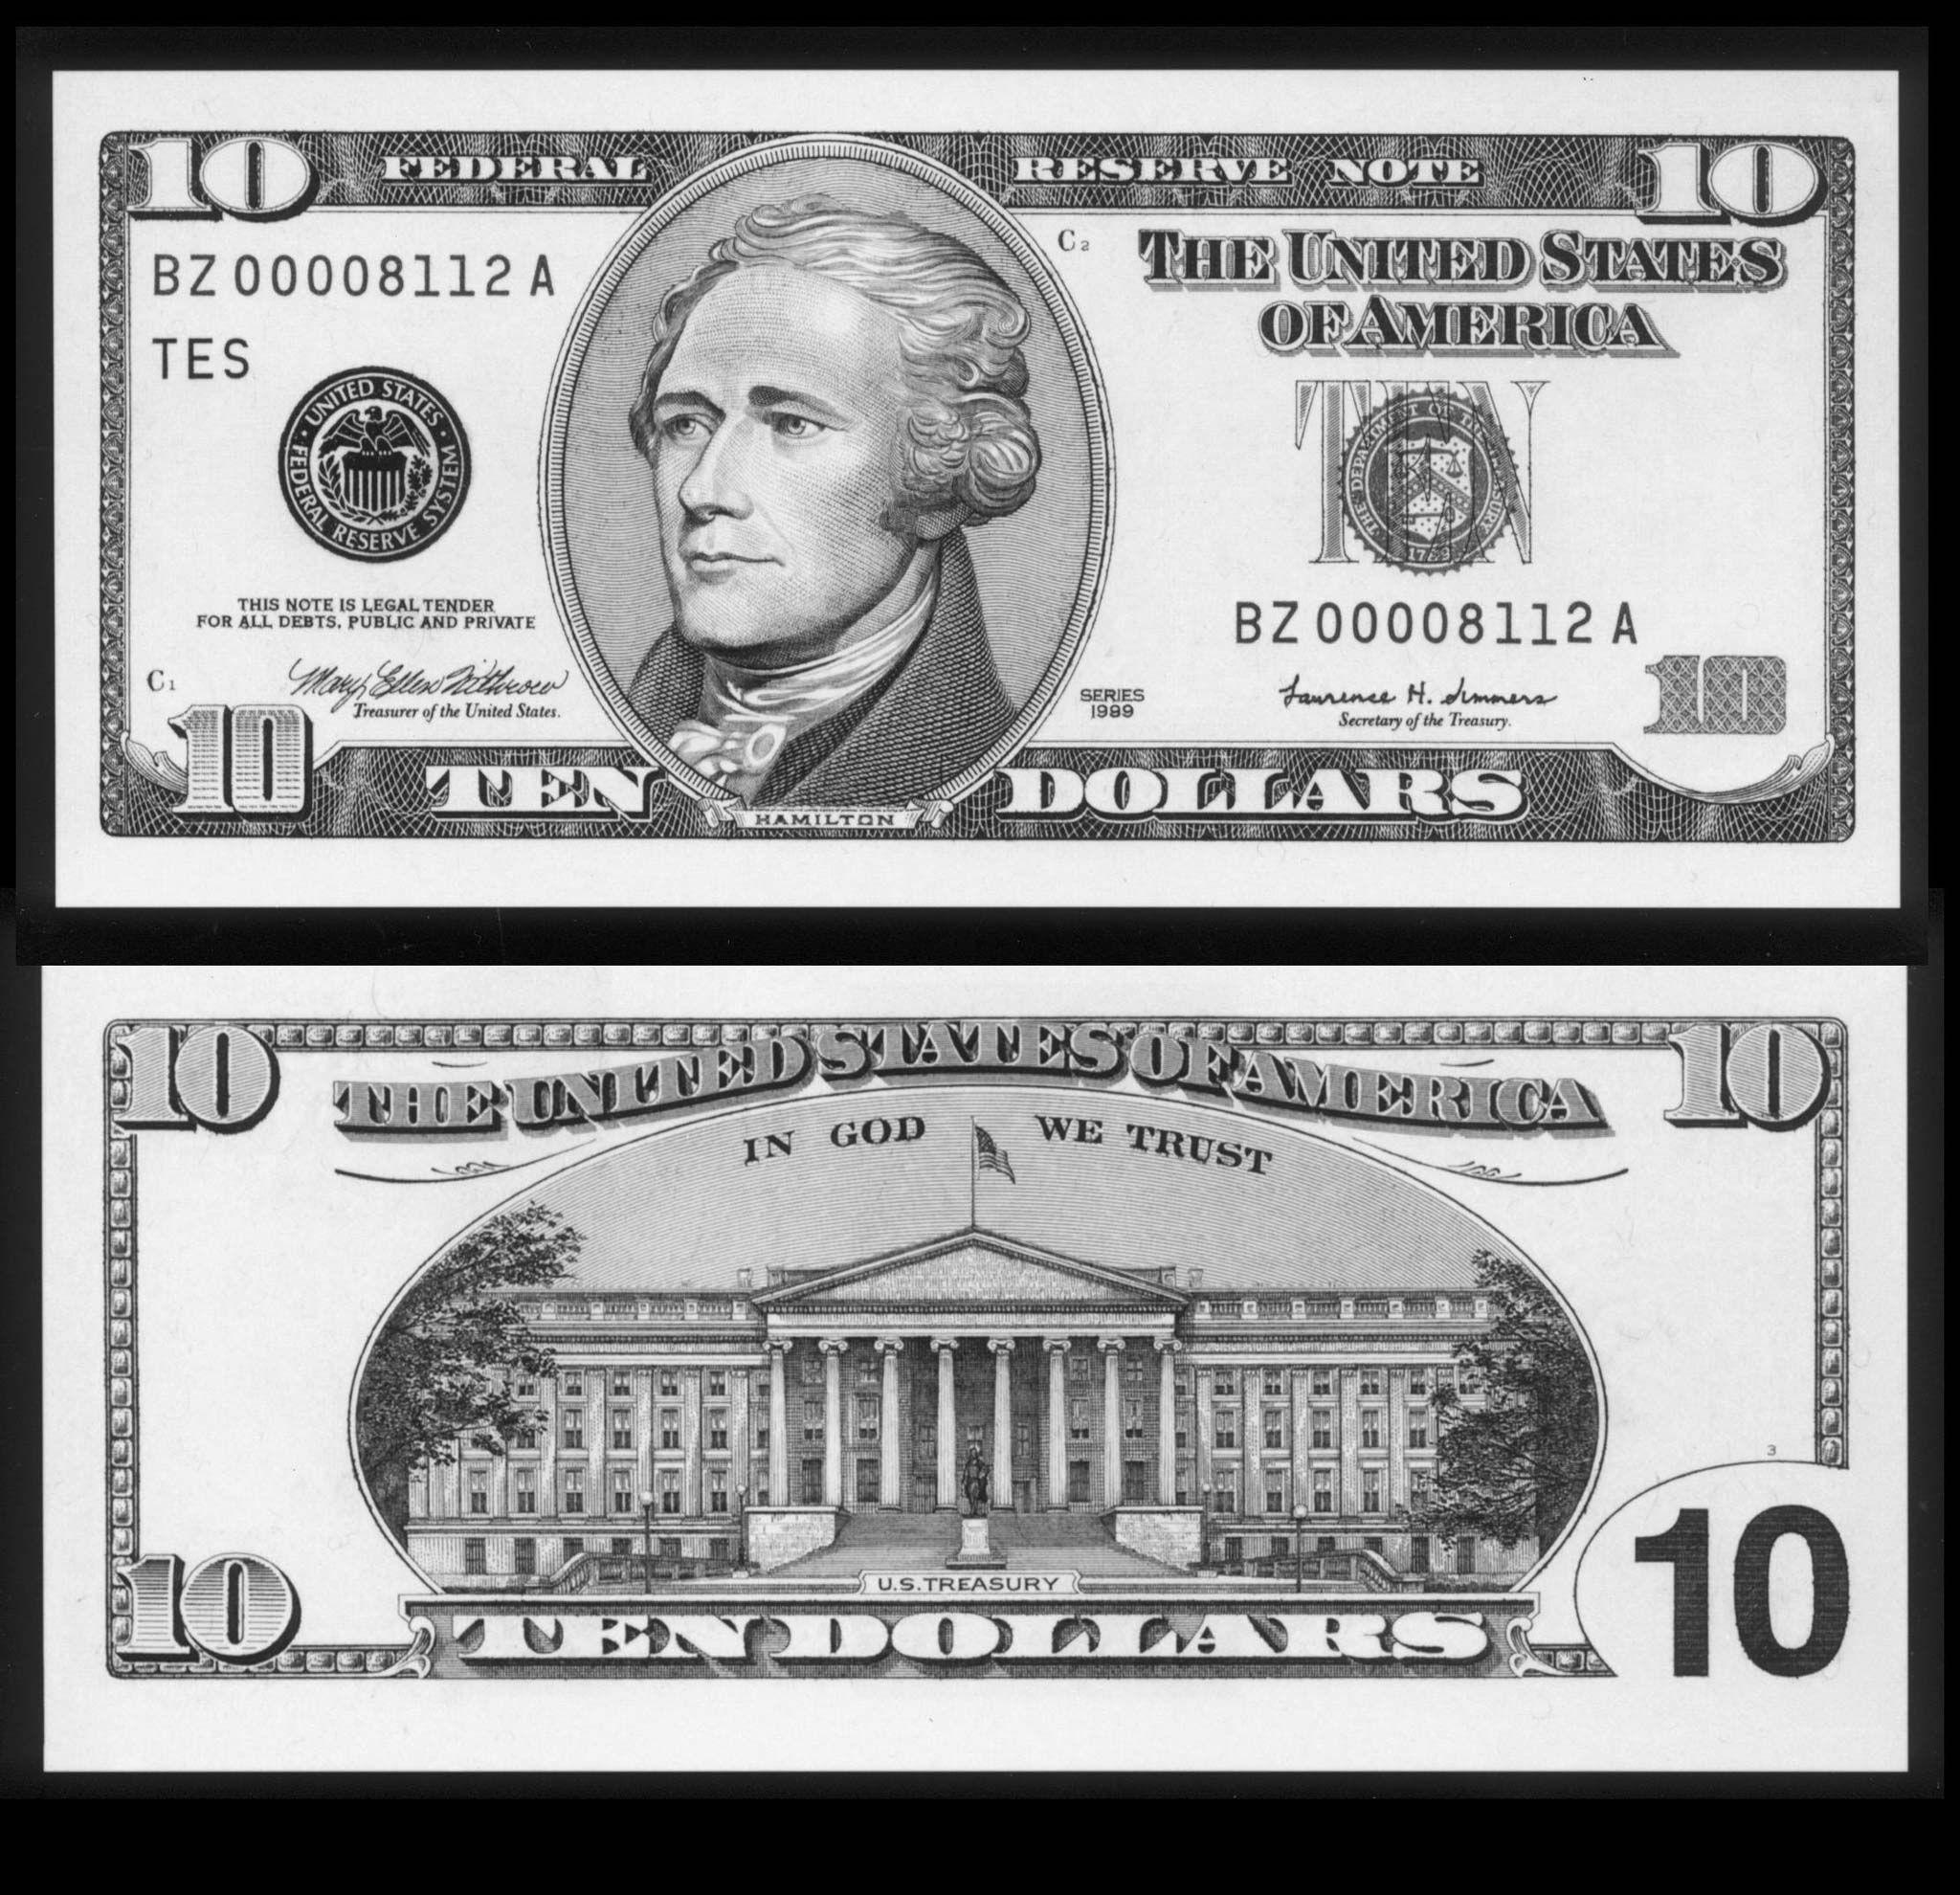 Why We Should Keep Alexander Hamilton On The 10 Bill